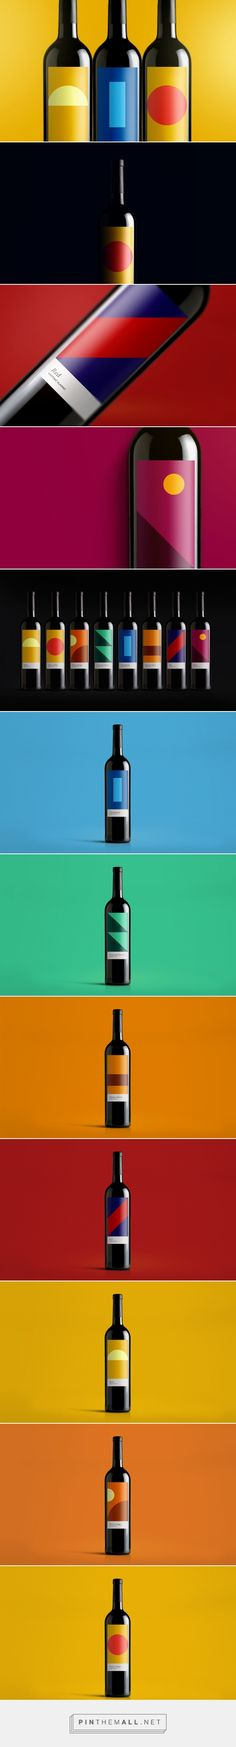 VK Wine packaging design by Size Clever Packaging, Wine Packaging, Wine Label Design, Bottle Design, Wine Wallpaper, Wine Display, Wine Brands, Wine Night, Wine Art